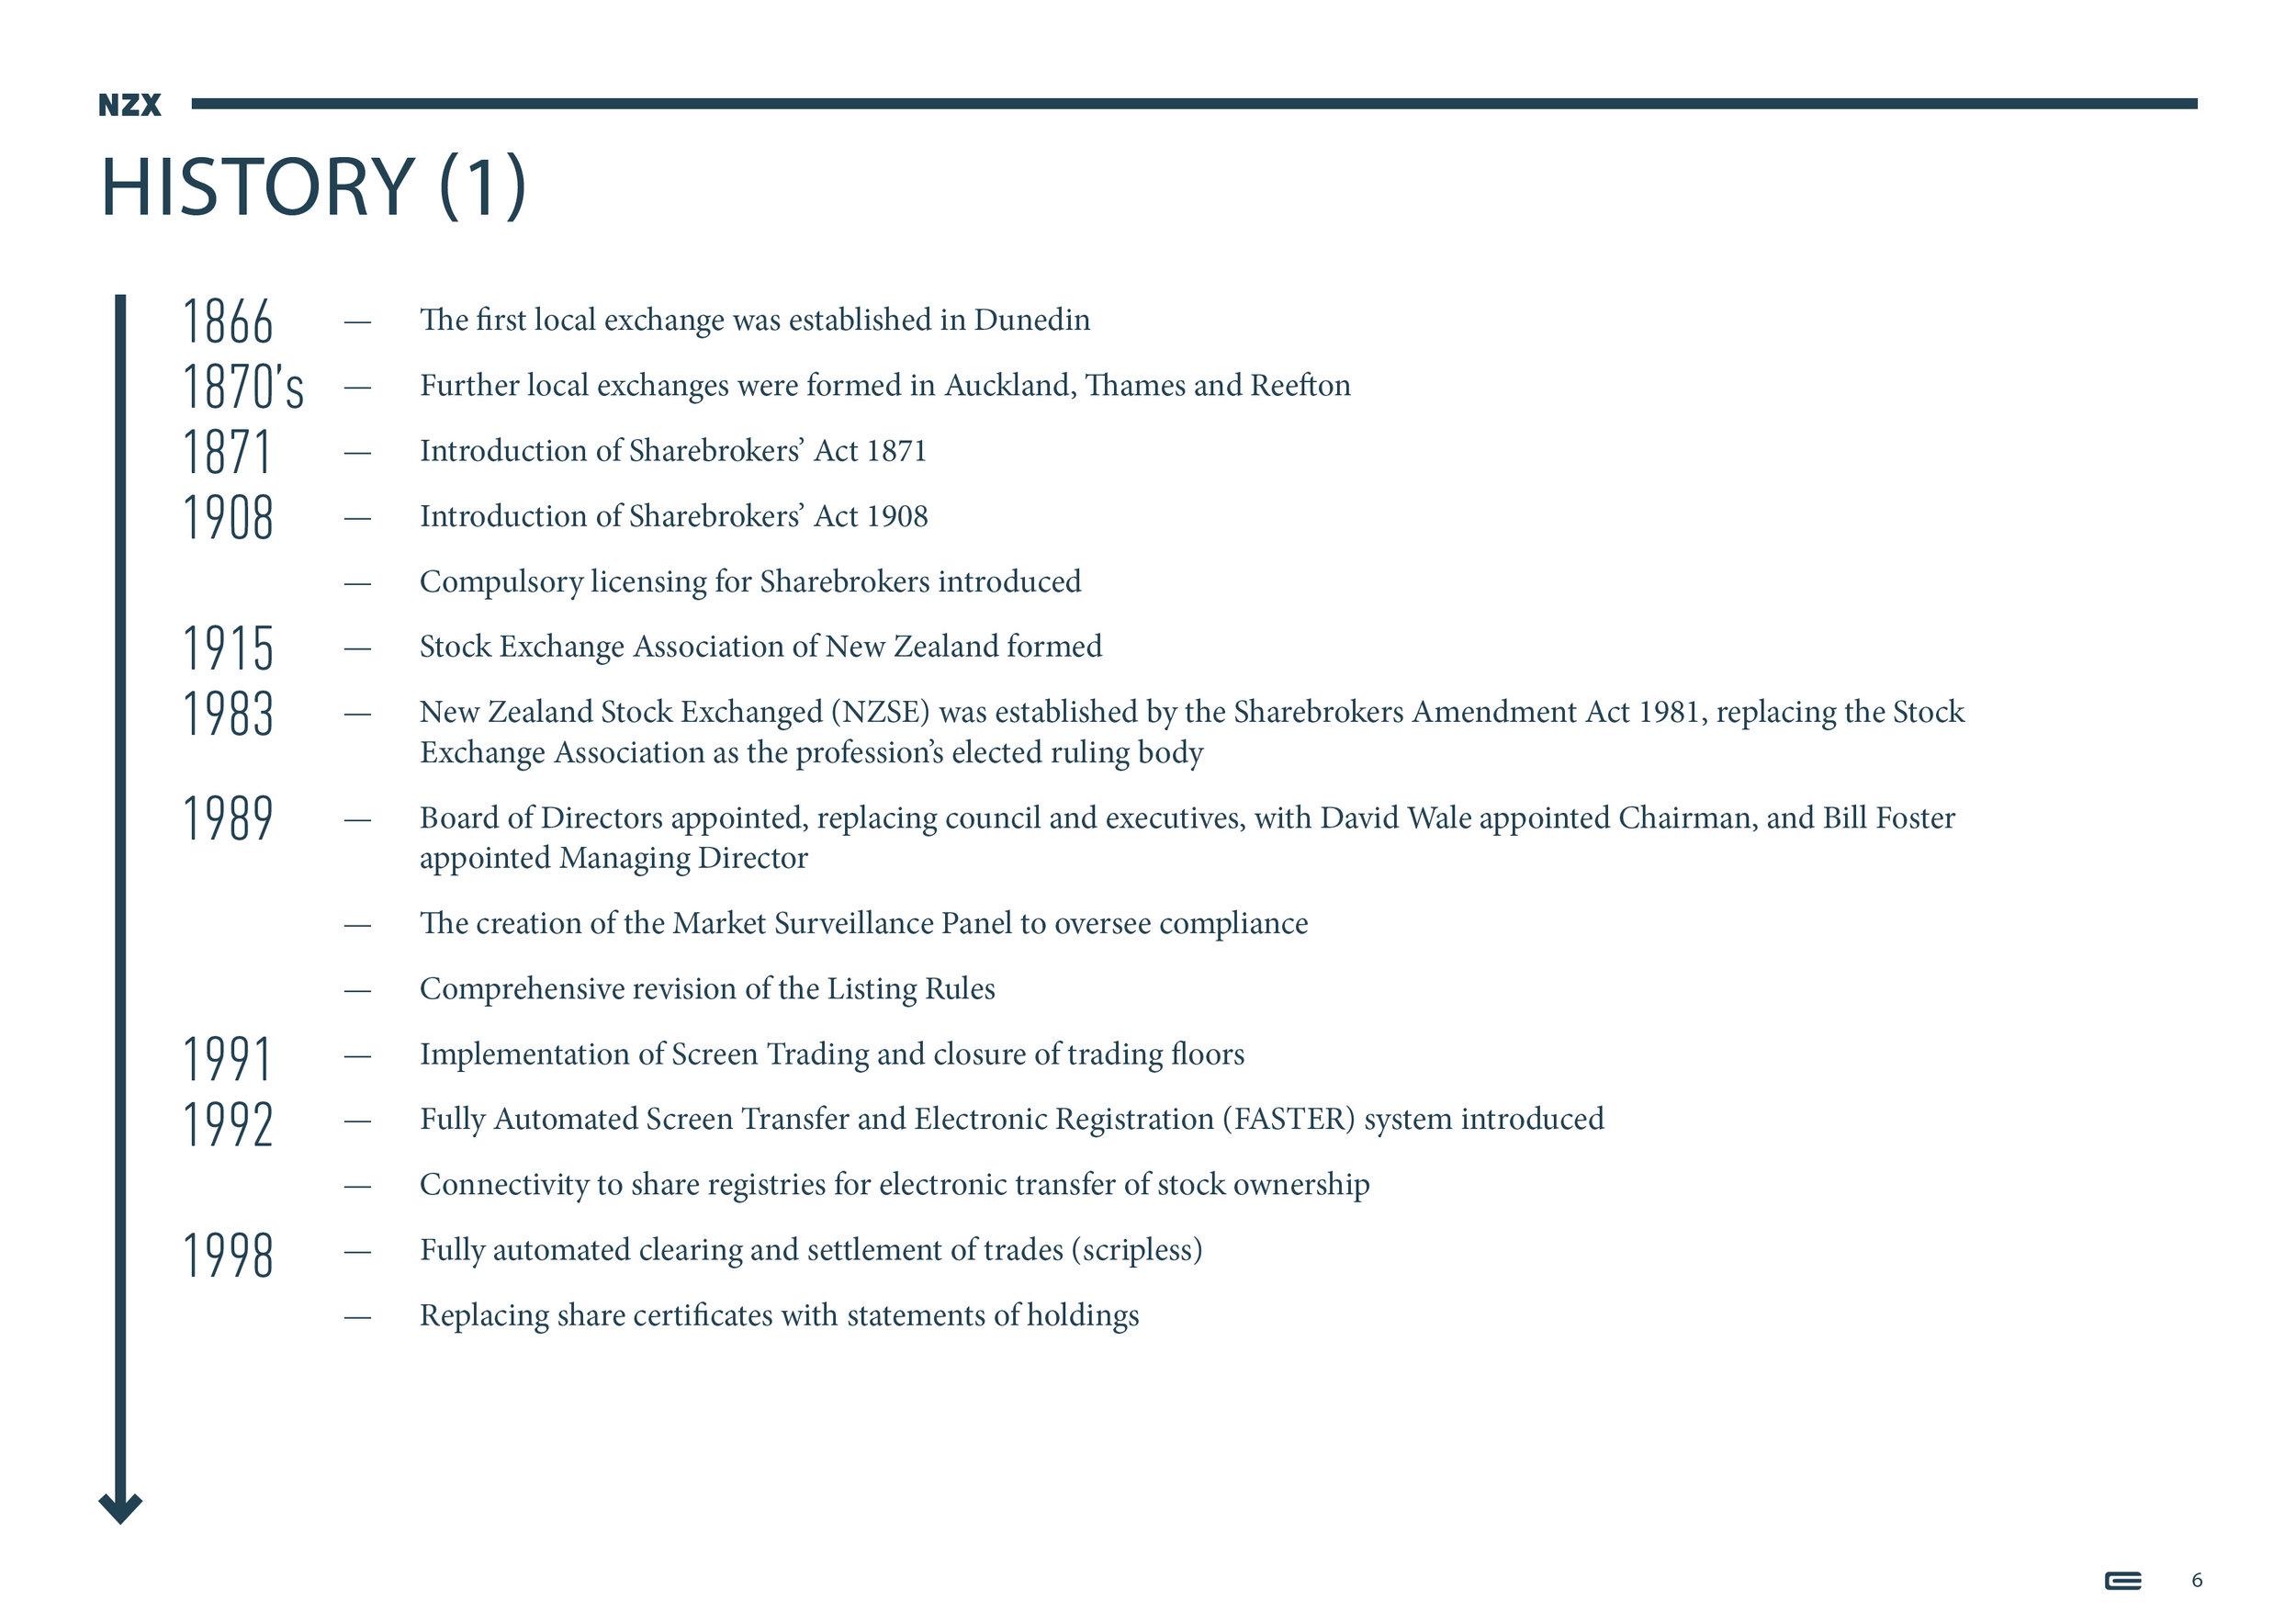 NZX Limited - Presentation - September 20186.jpg